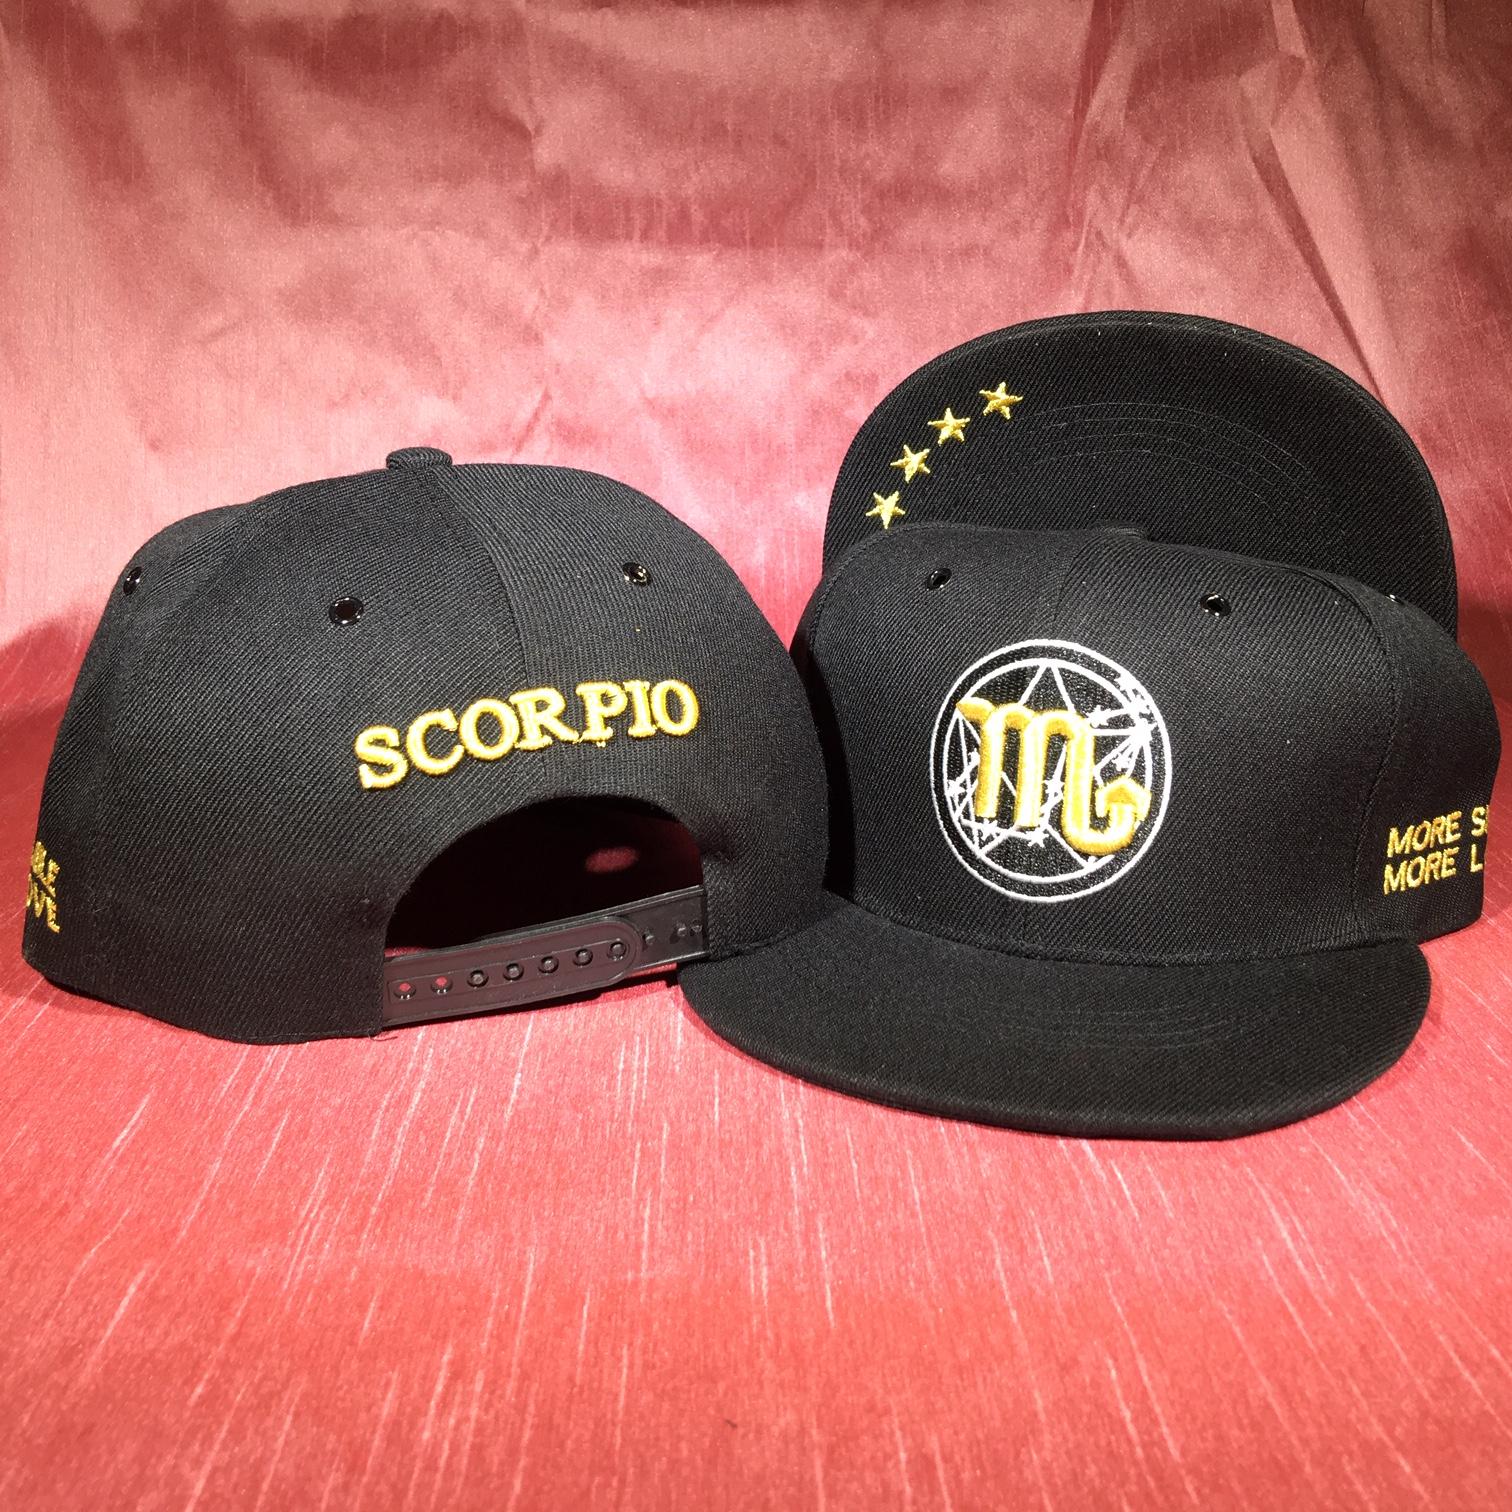 Scorpio Flat Back Baseball Cap   (October 23 to November 21)